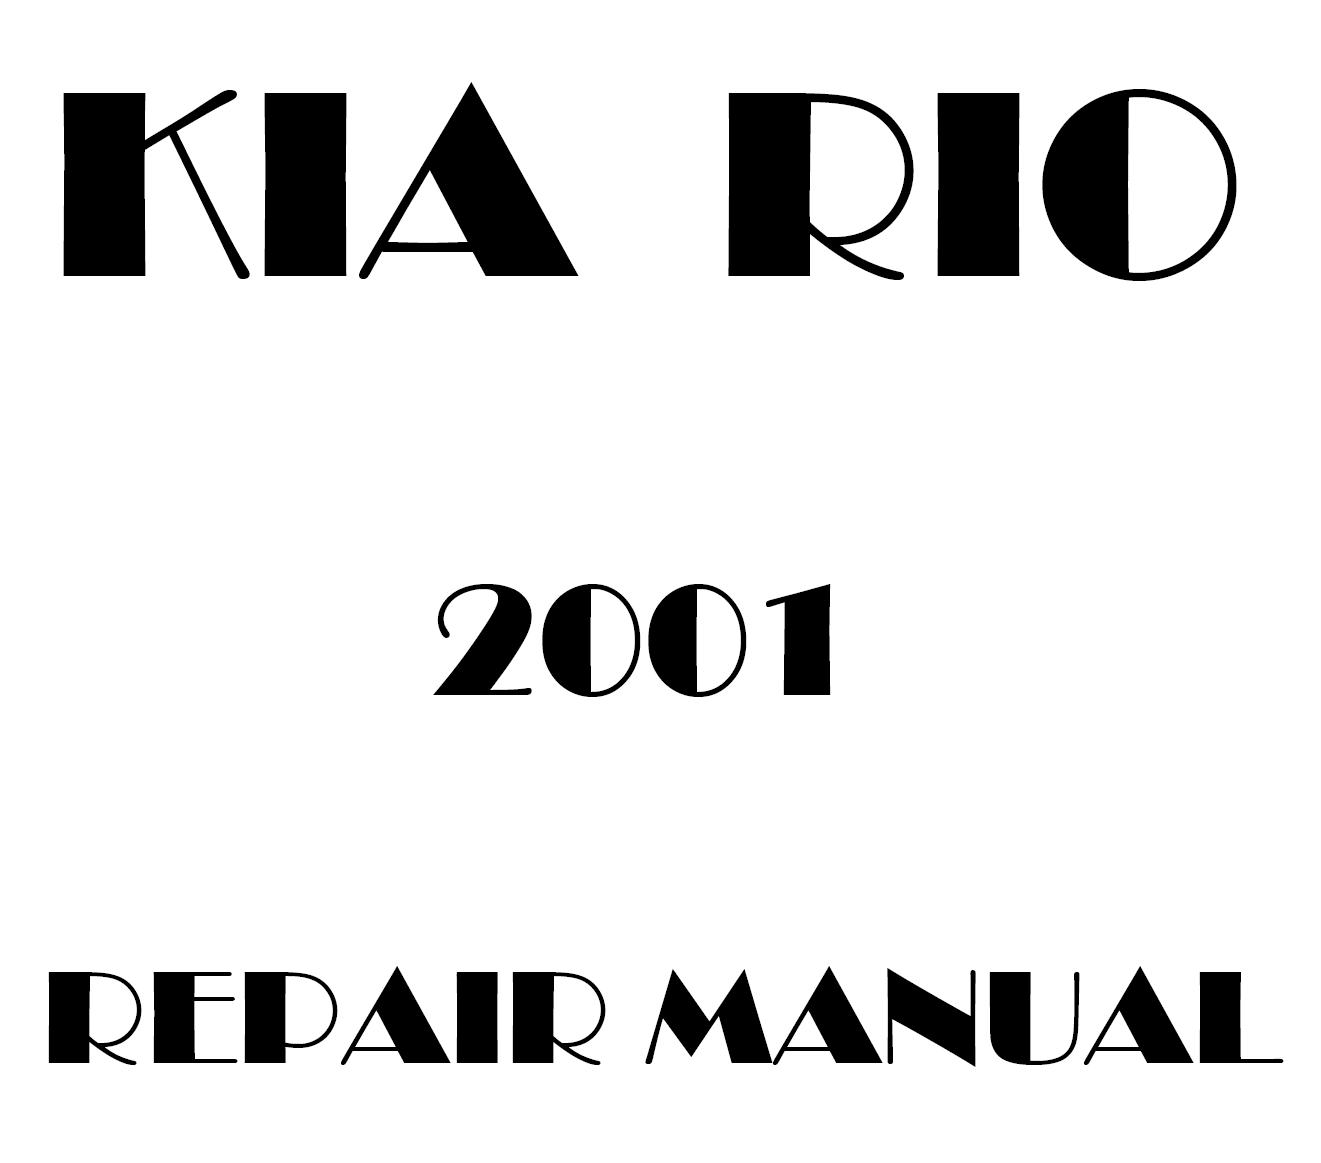 2001 Kia Rio repair manual